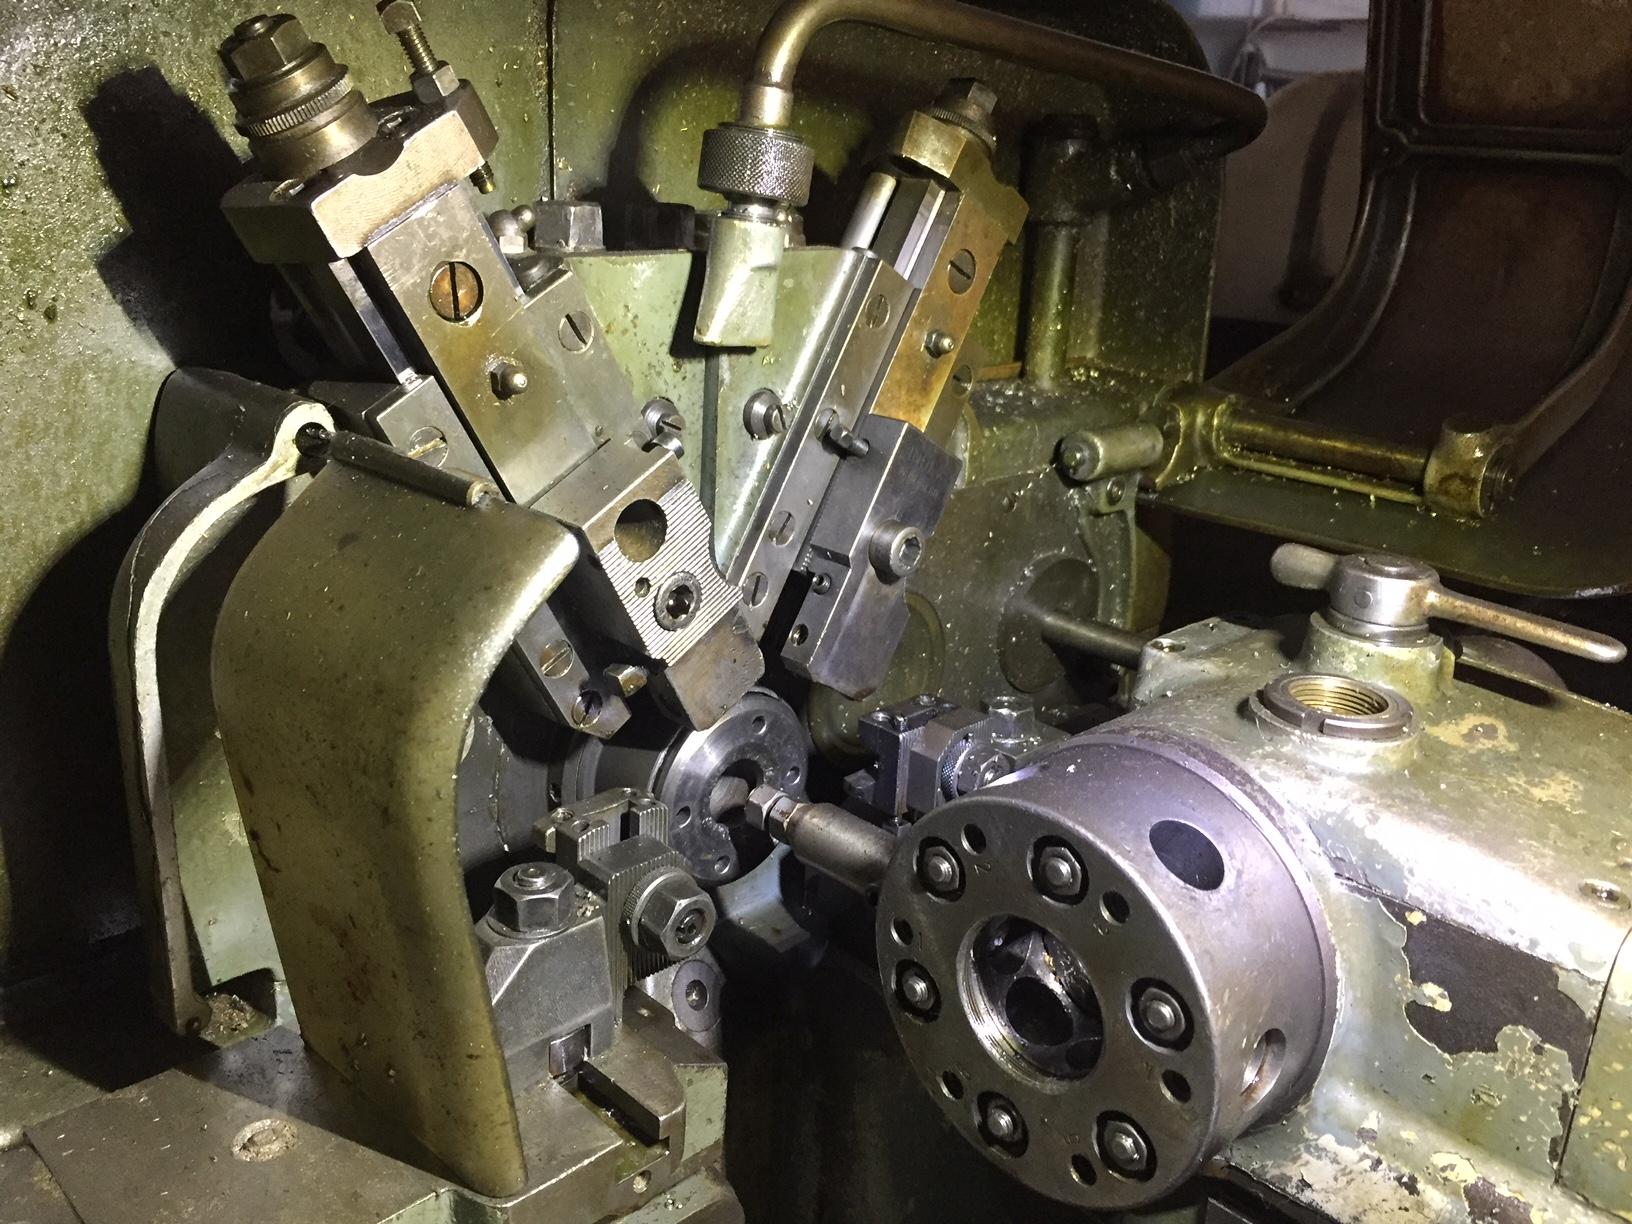 Lot 49 - Index Model DG 12-2, Single Spindle Automatic Lathe